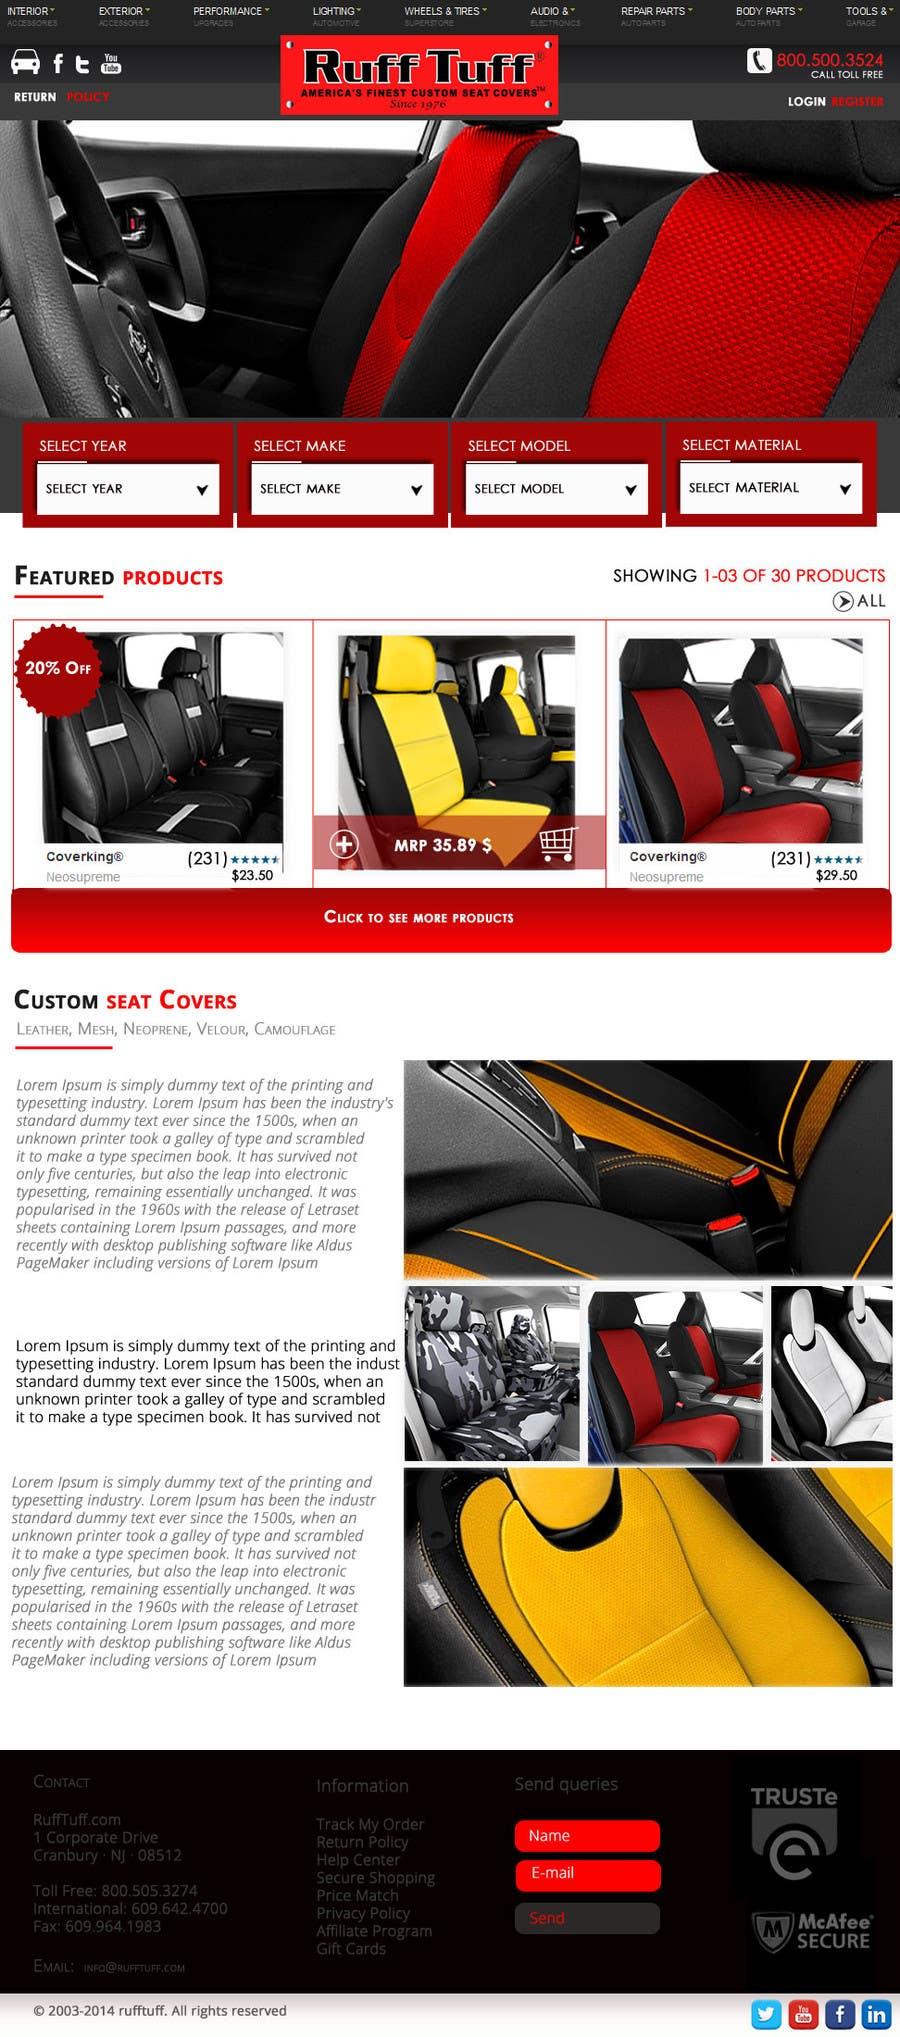 Penyertaan Peraduan #                                        31                                      untuk                                         Design a Website Mockup for an auto seat cover manufacturer